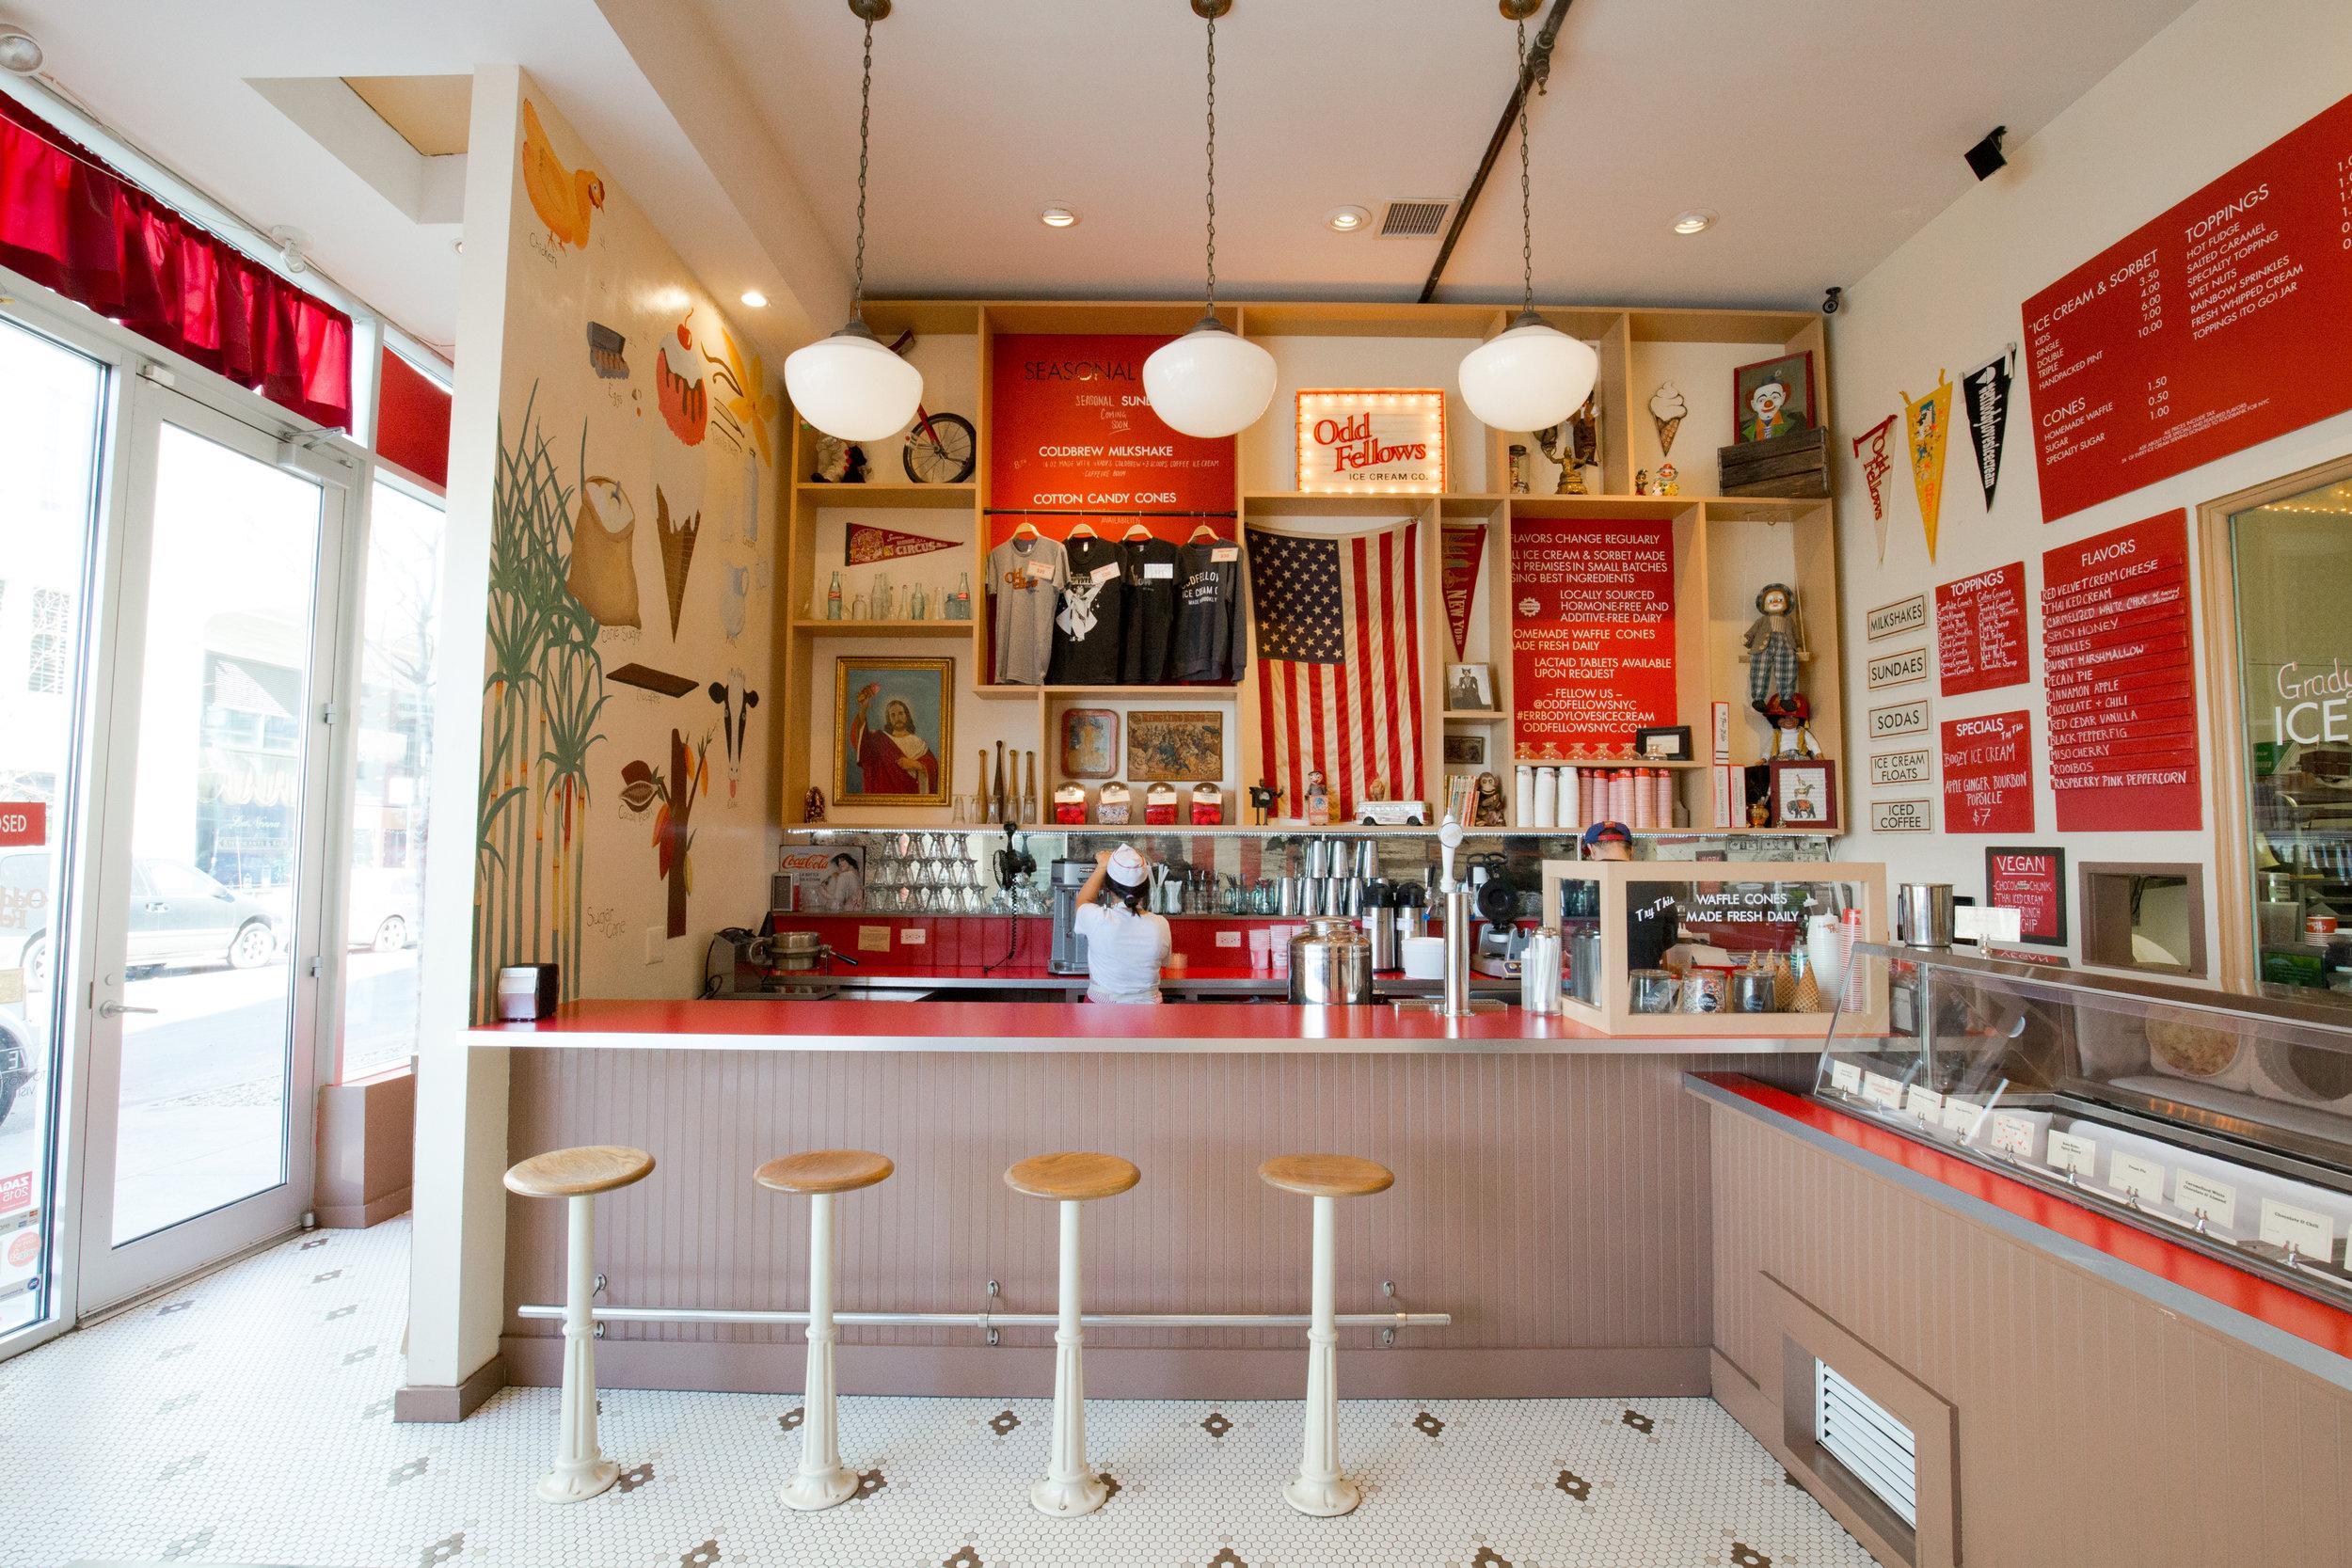 OddFellows Ice Cream Co, NYC.